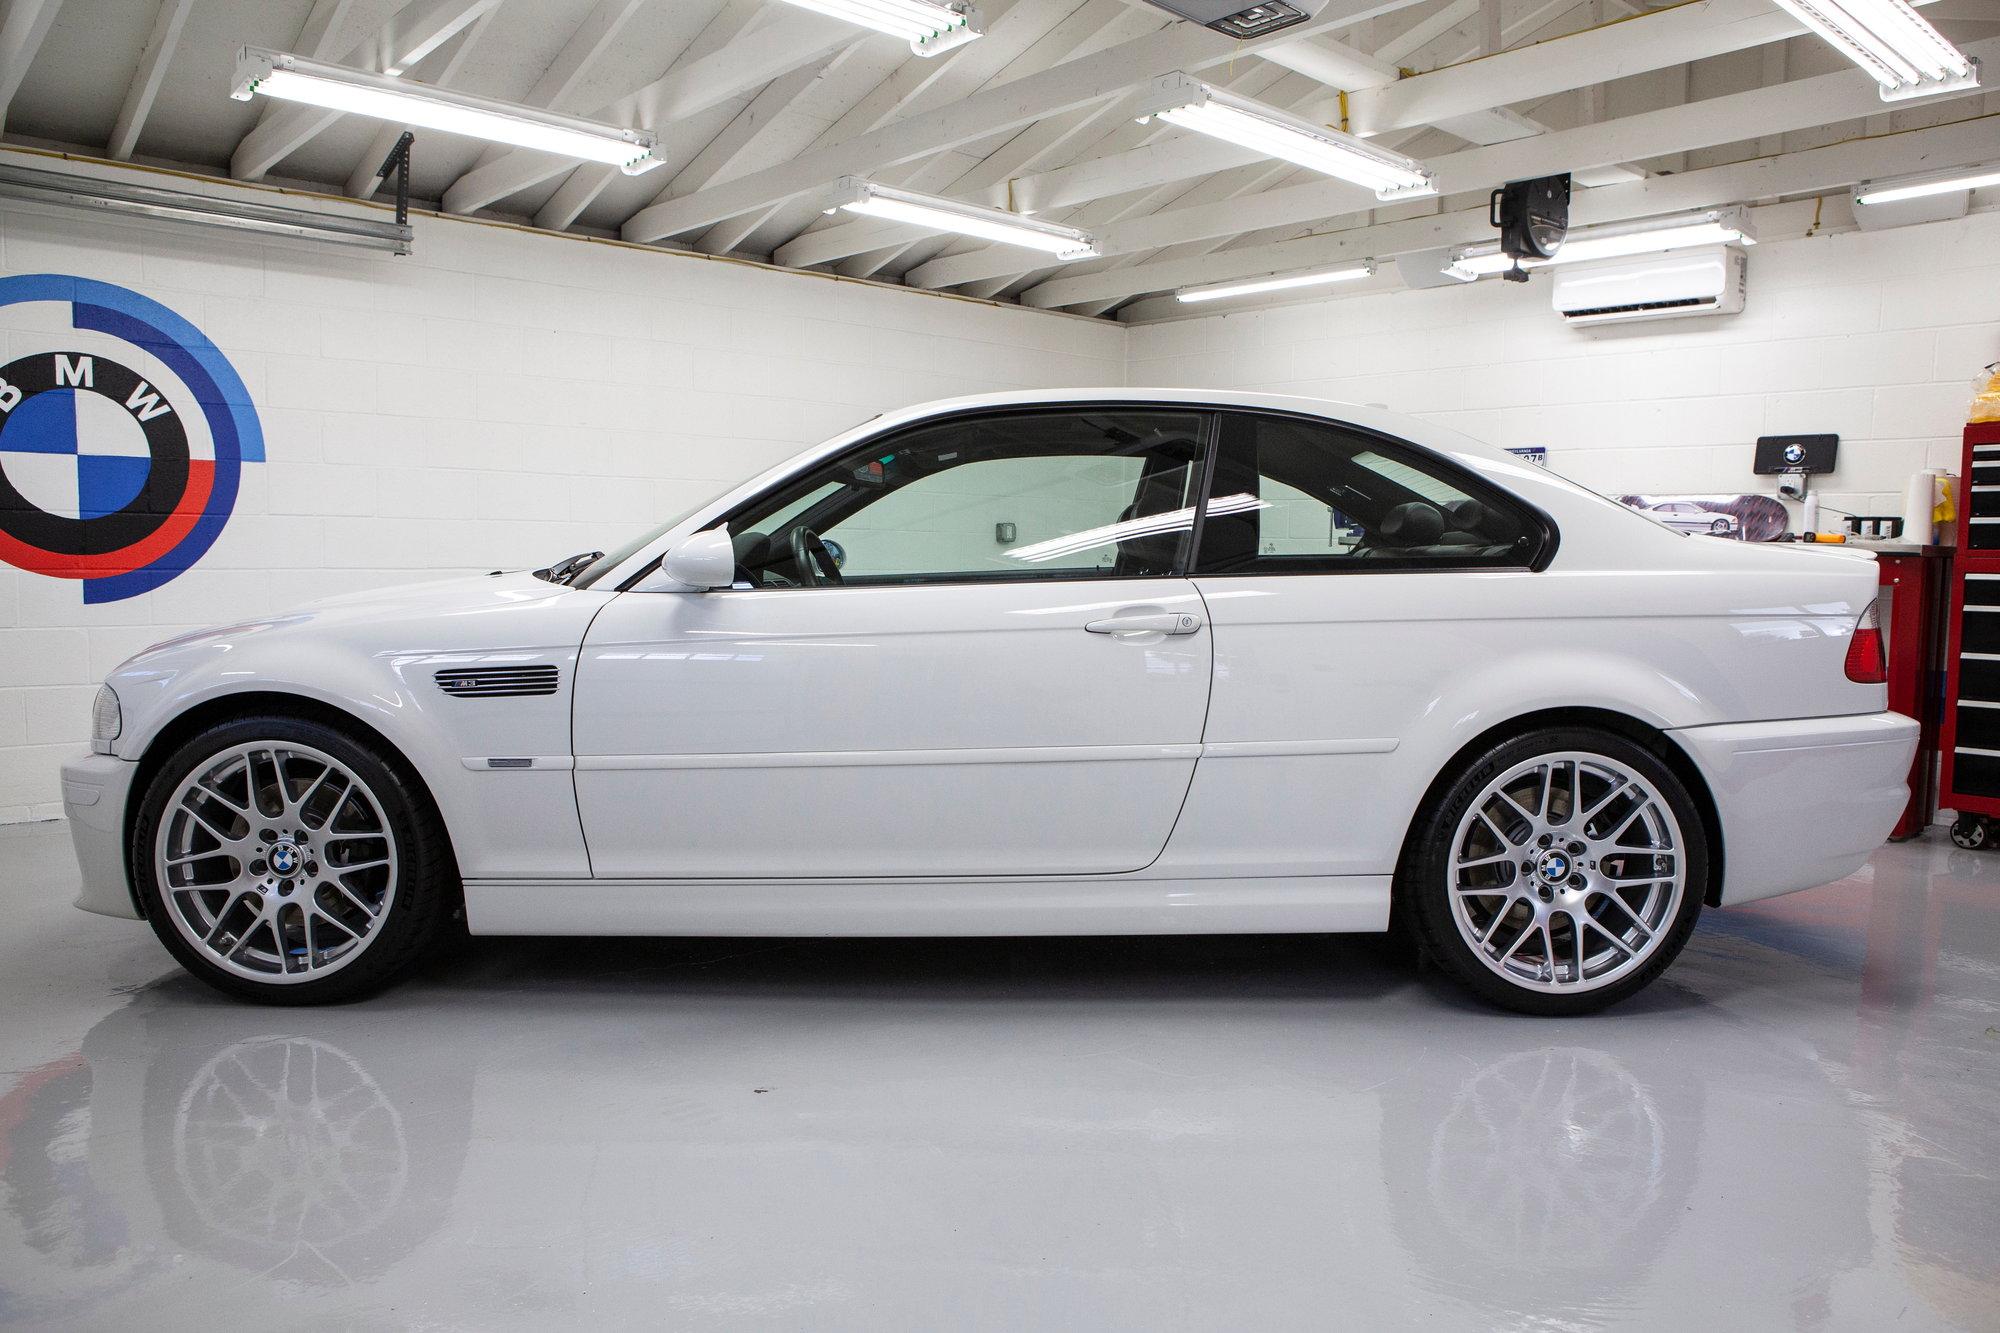 2006 BMW M3 / Alpine White / Black / 6-Speed / 59k Miles / PA 19008 ...